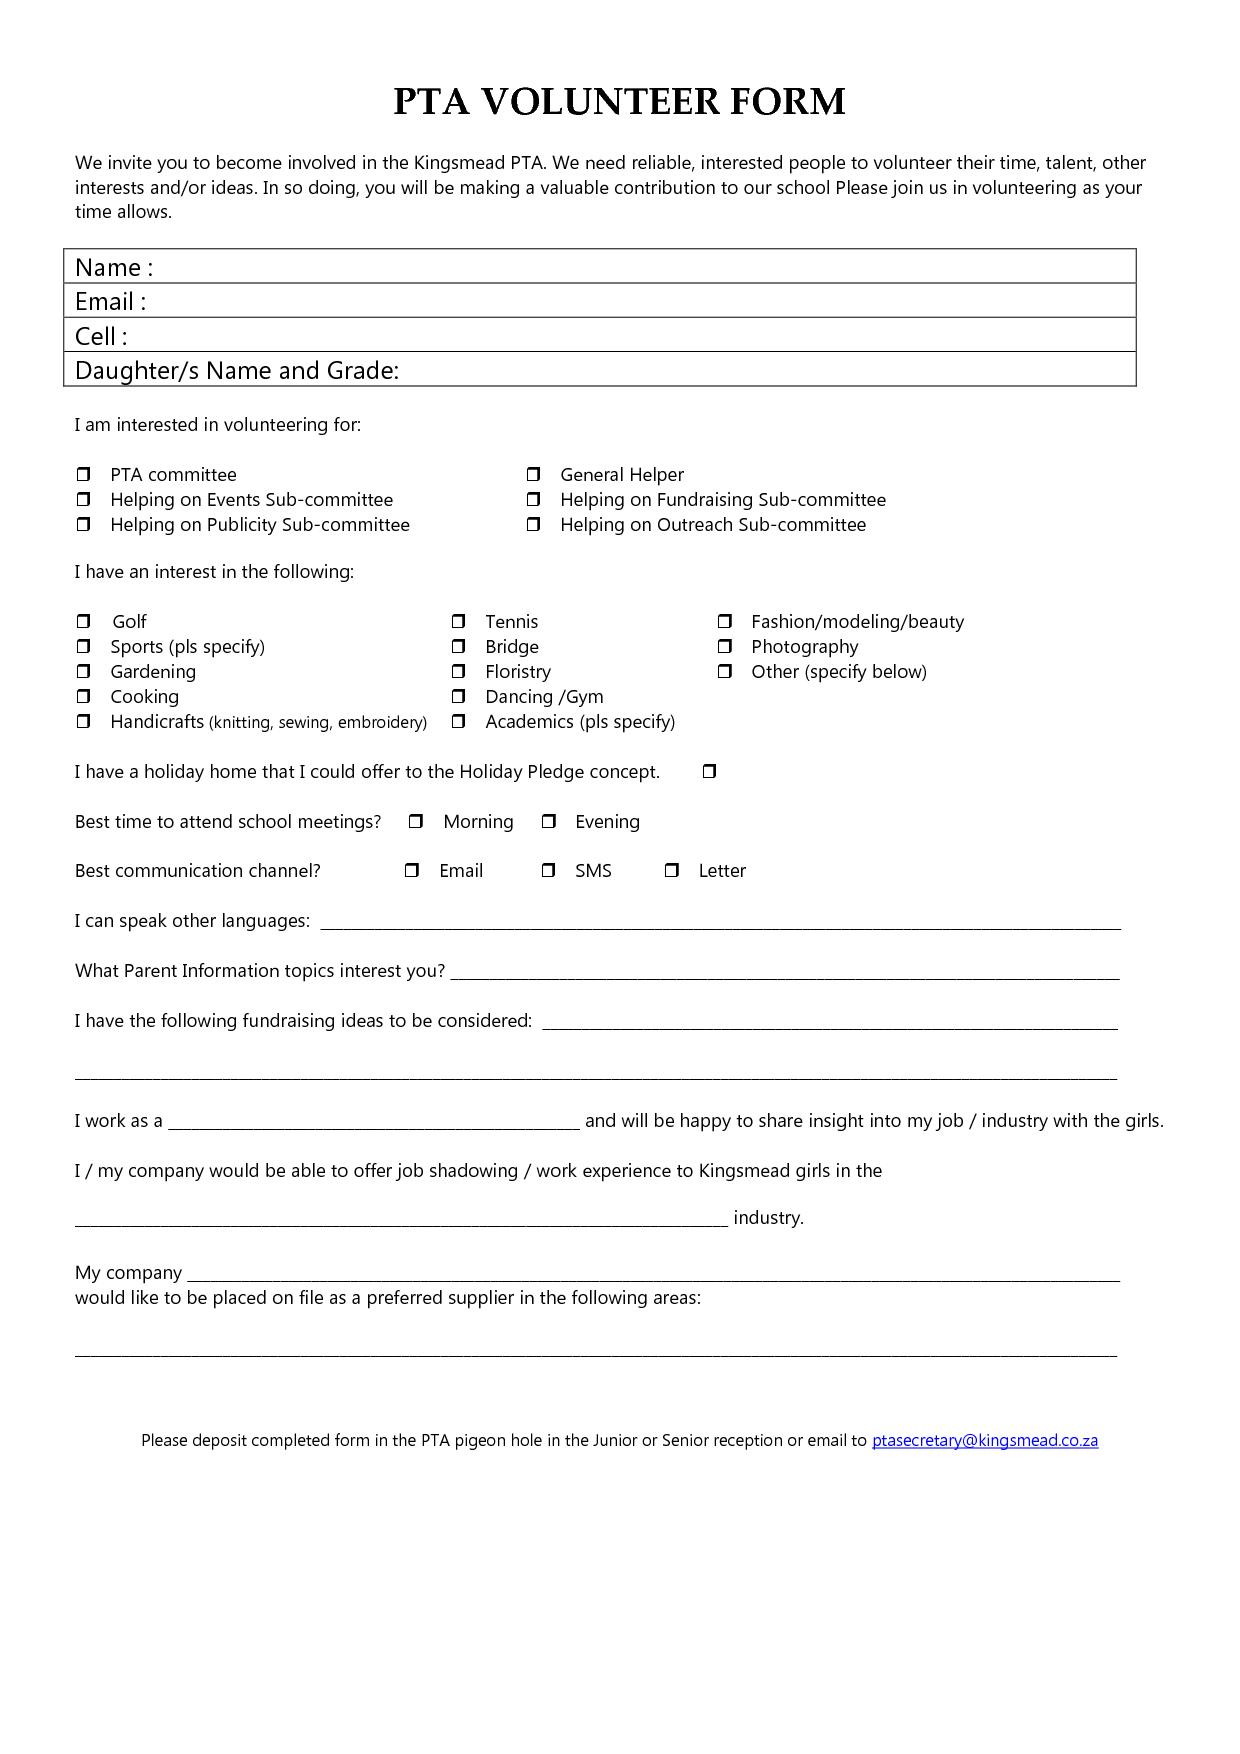 32f99e379a2c628016525c74f1c921ac Volunteer Recruitment Letter Templates on volunteer appreciation letter templates, volunteer recruitment banners, volunteer recruitment brochures, volunteer recruitment email, volunteer recruitment invitations, volunteer recruitment posters, volunteer community service letter sample, volunteer recruitment flyers,